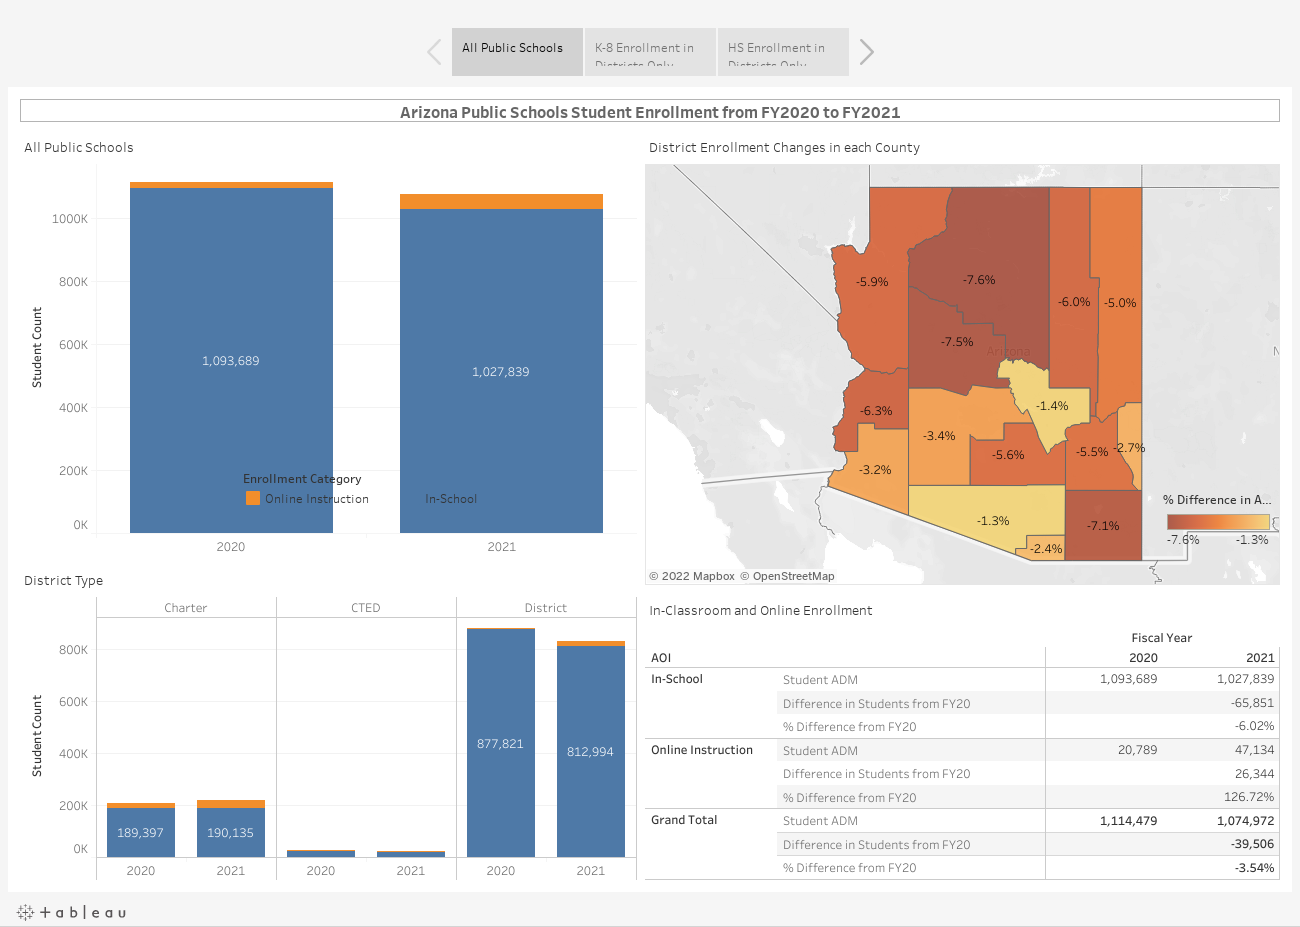 Declining enrollment's impact on Arizona Schools https://public.tableau.com/static/images/En/EnrollmentChanges20to21/Story1/1_rss